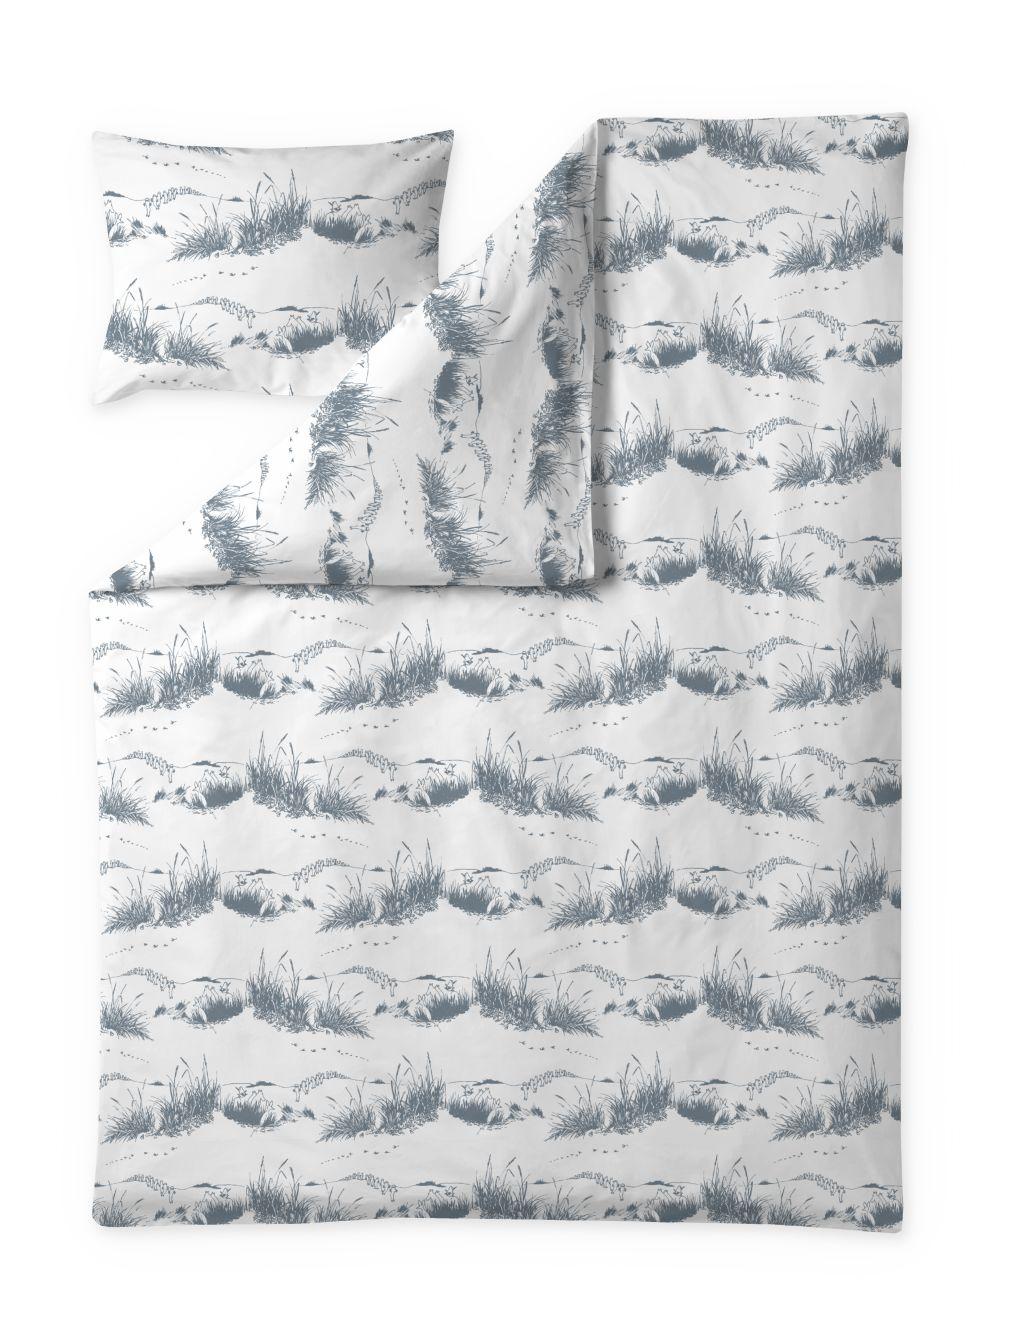 Finlayson Dune Moomin Jersey Duvet Cover Set